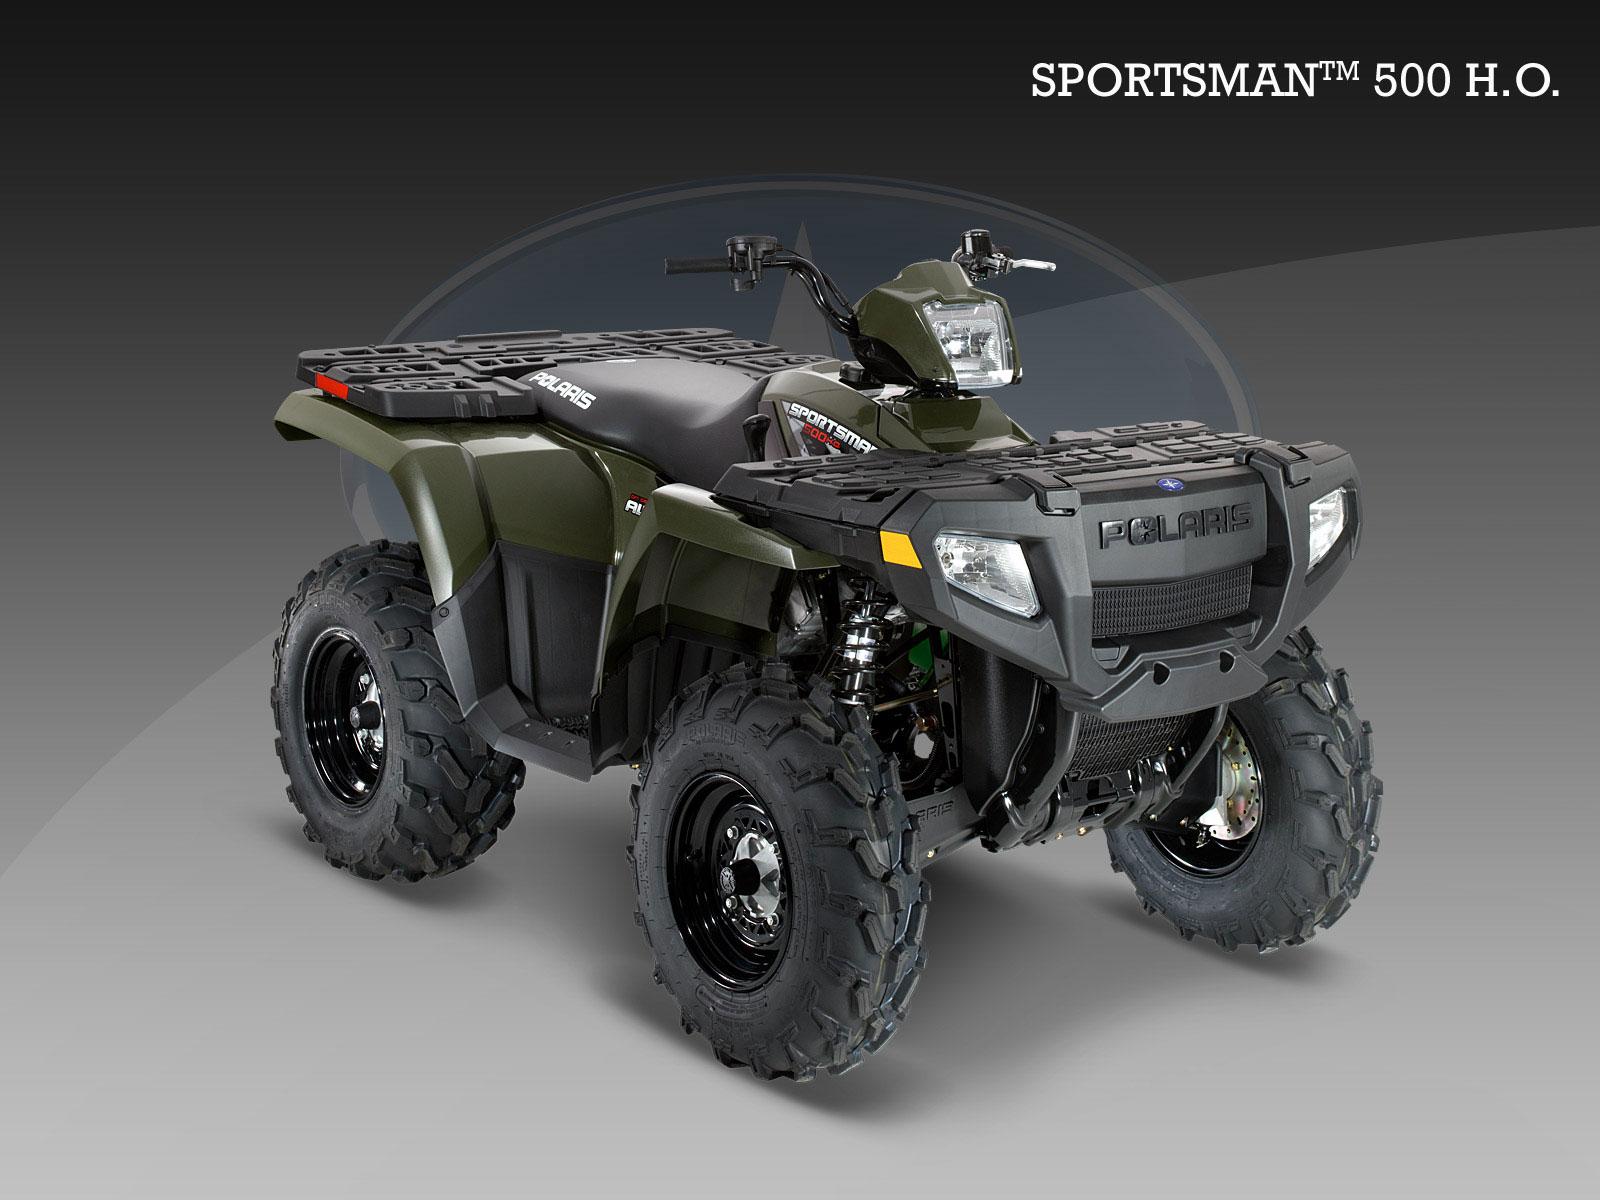 POLARIS Sportsman 500 H O  specs - 2008, 2009 - autoevolution